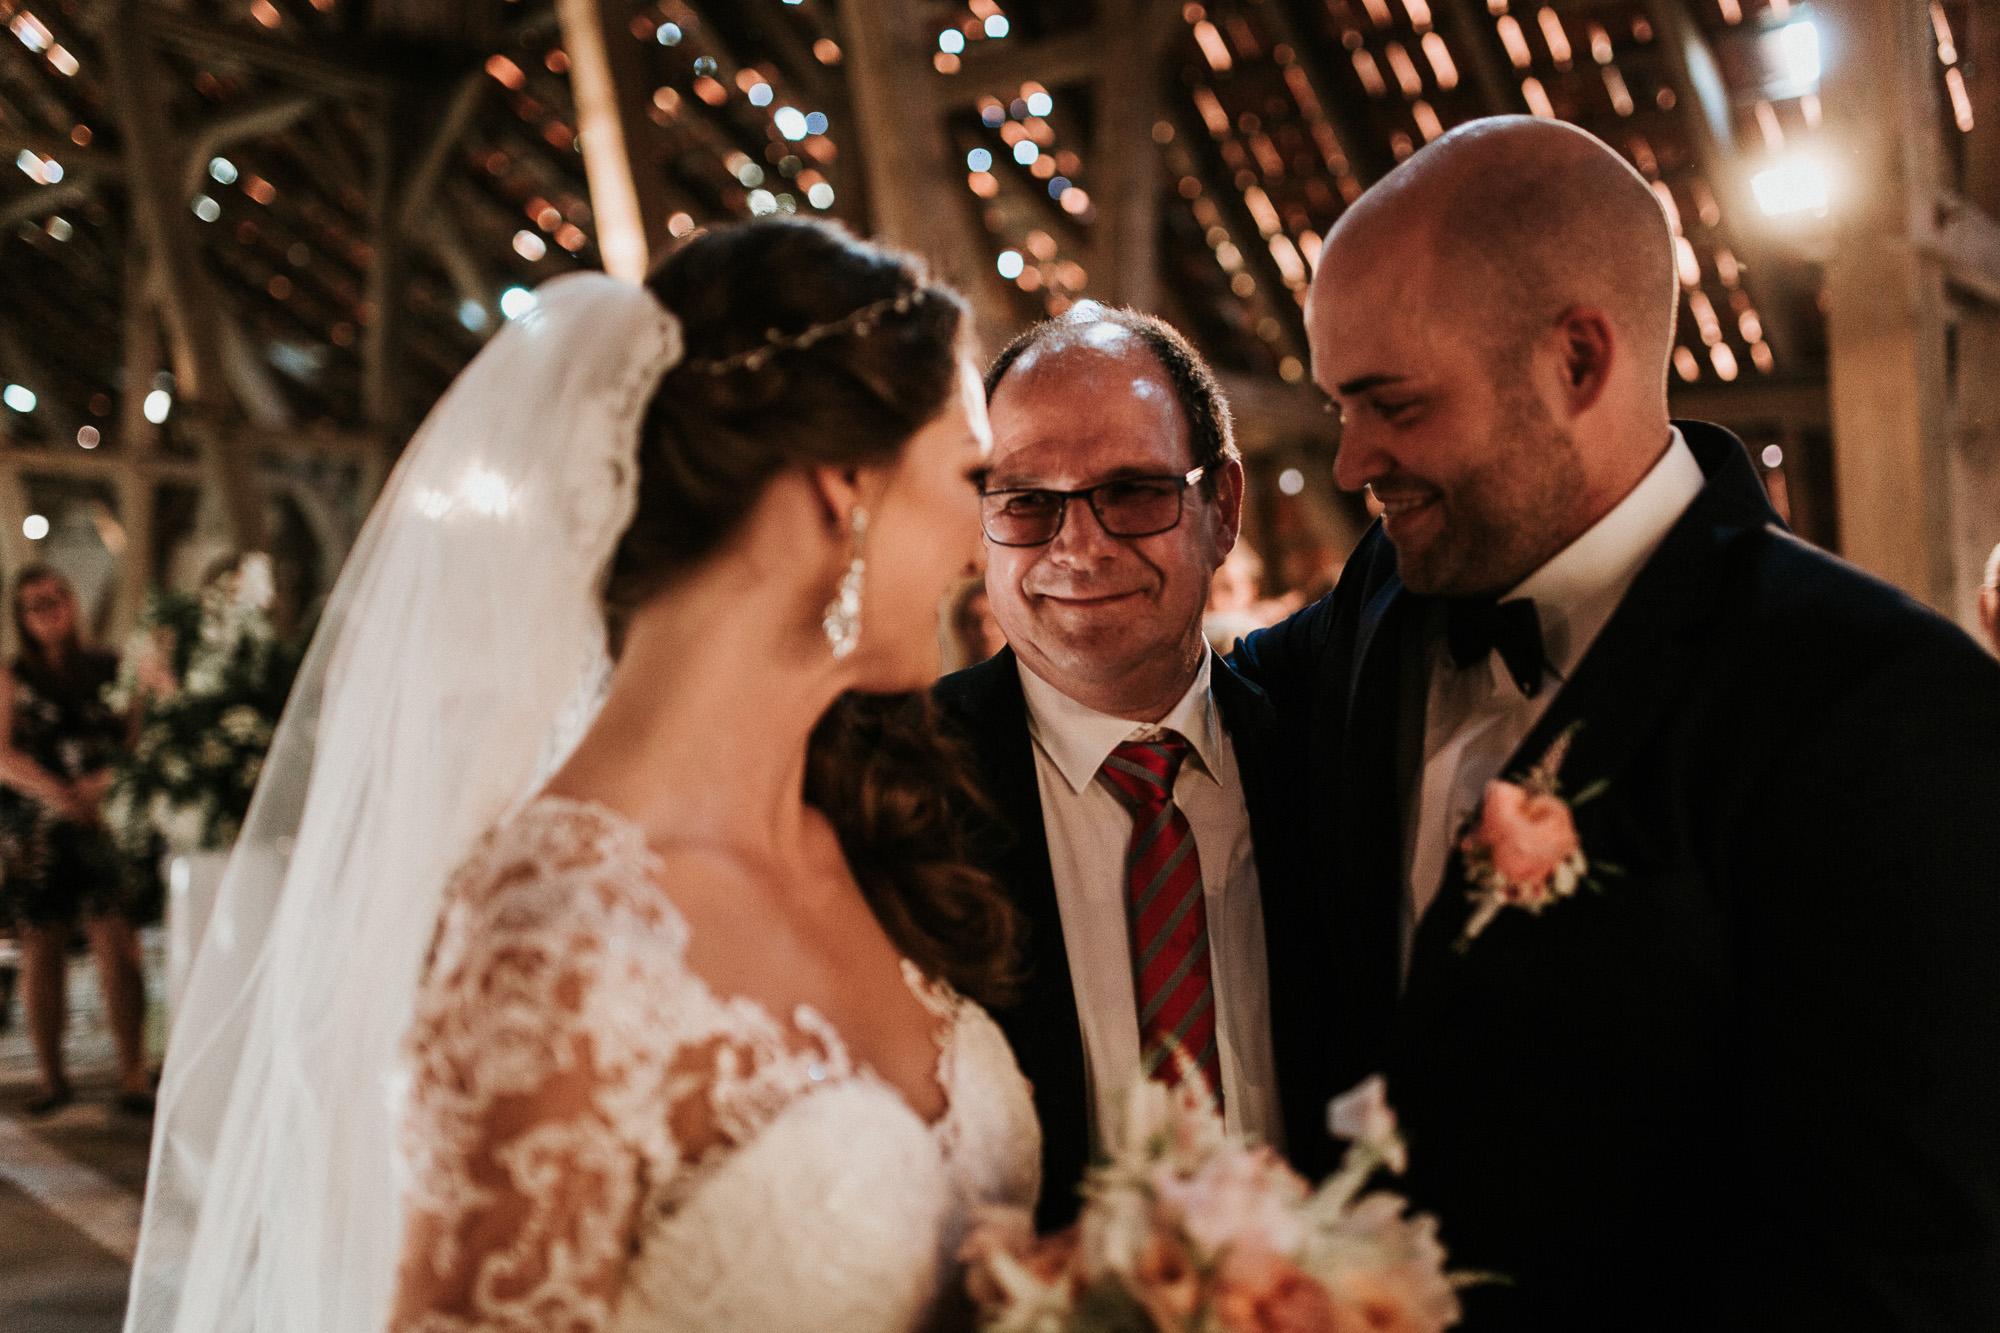 DanielaMarquardtPhotography_Hochzeitsfotograf_Düsseldorf_Köln_Mallorca_Bayern_Austria_Harz_Wedding_AileenundLennart_Weddingphotographer_Ibiza_Tuskany_Italien_Toskana_Portugal_Lissabon114